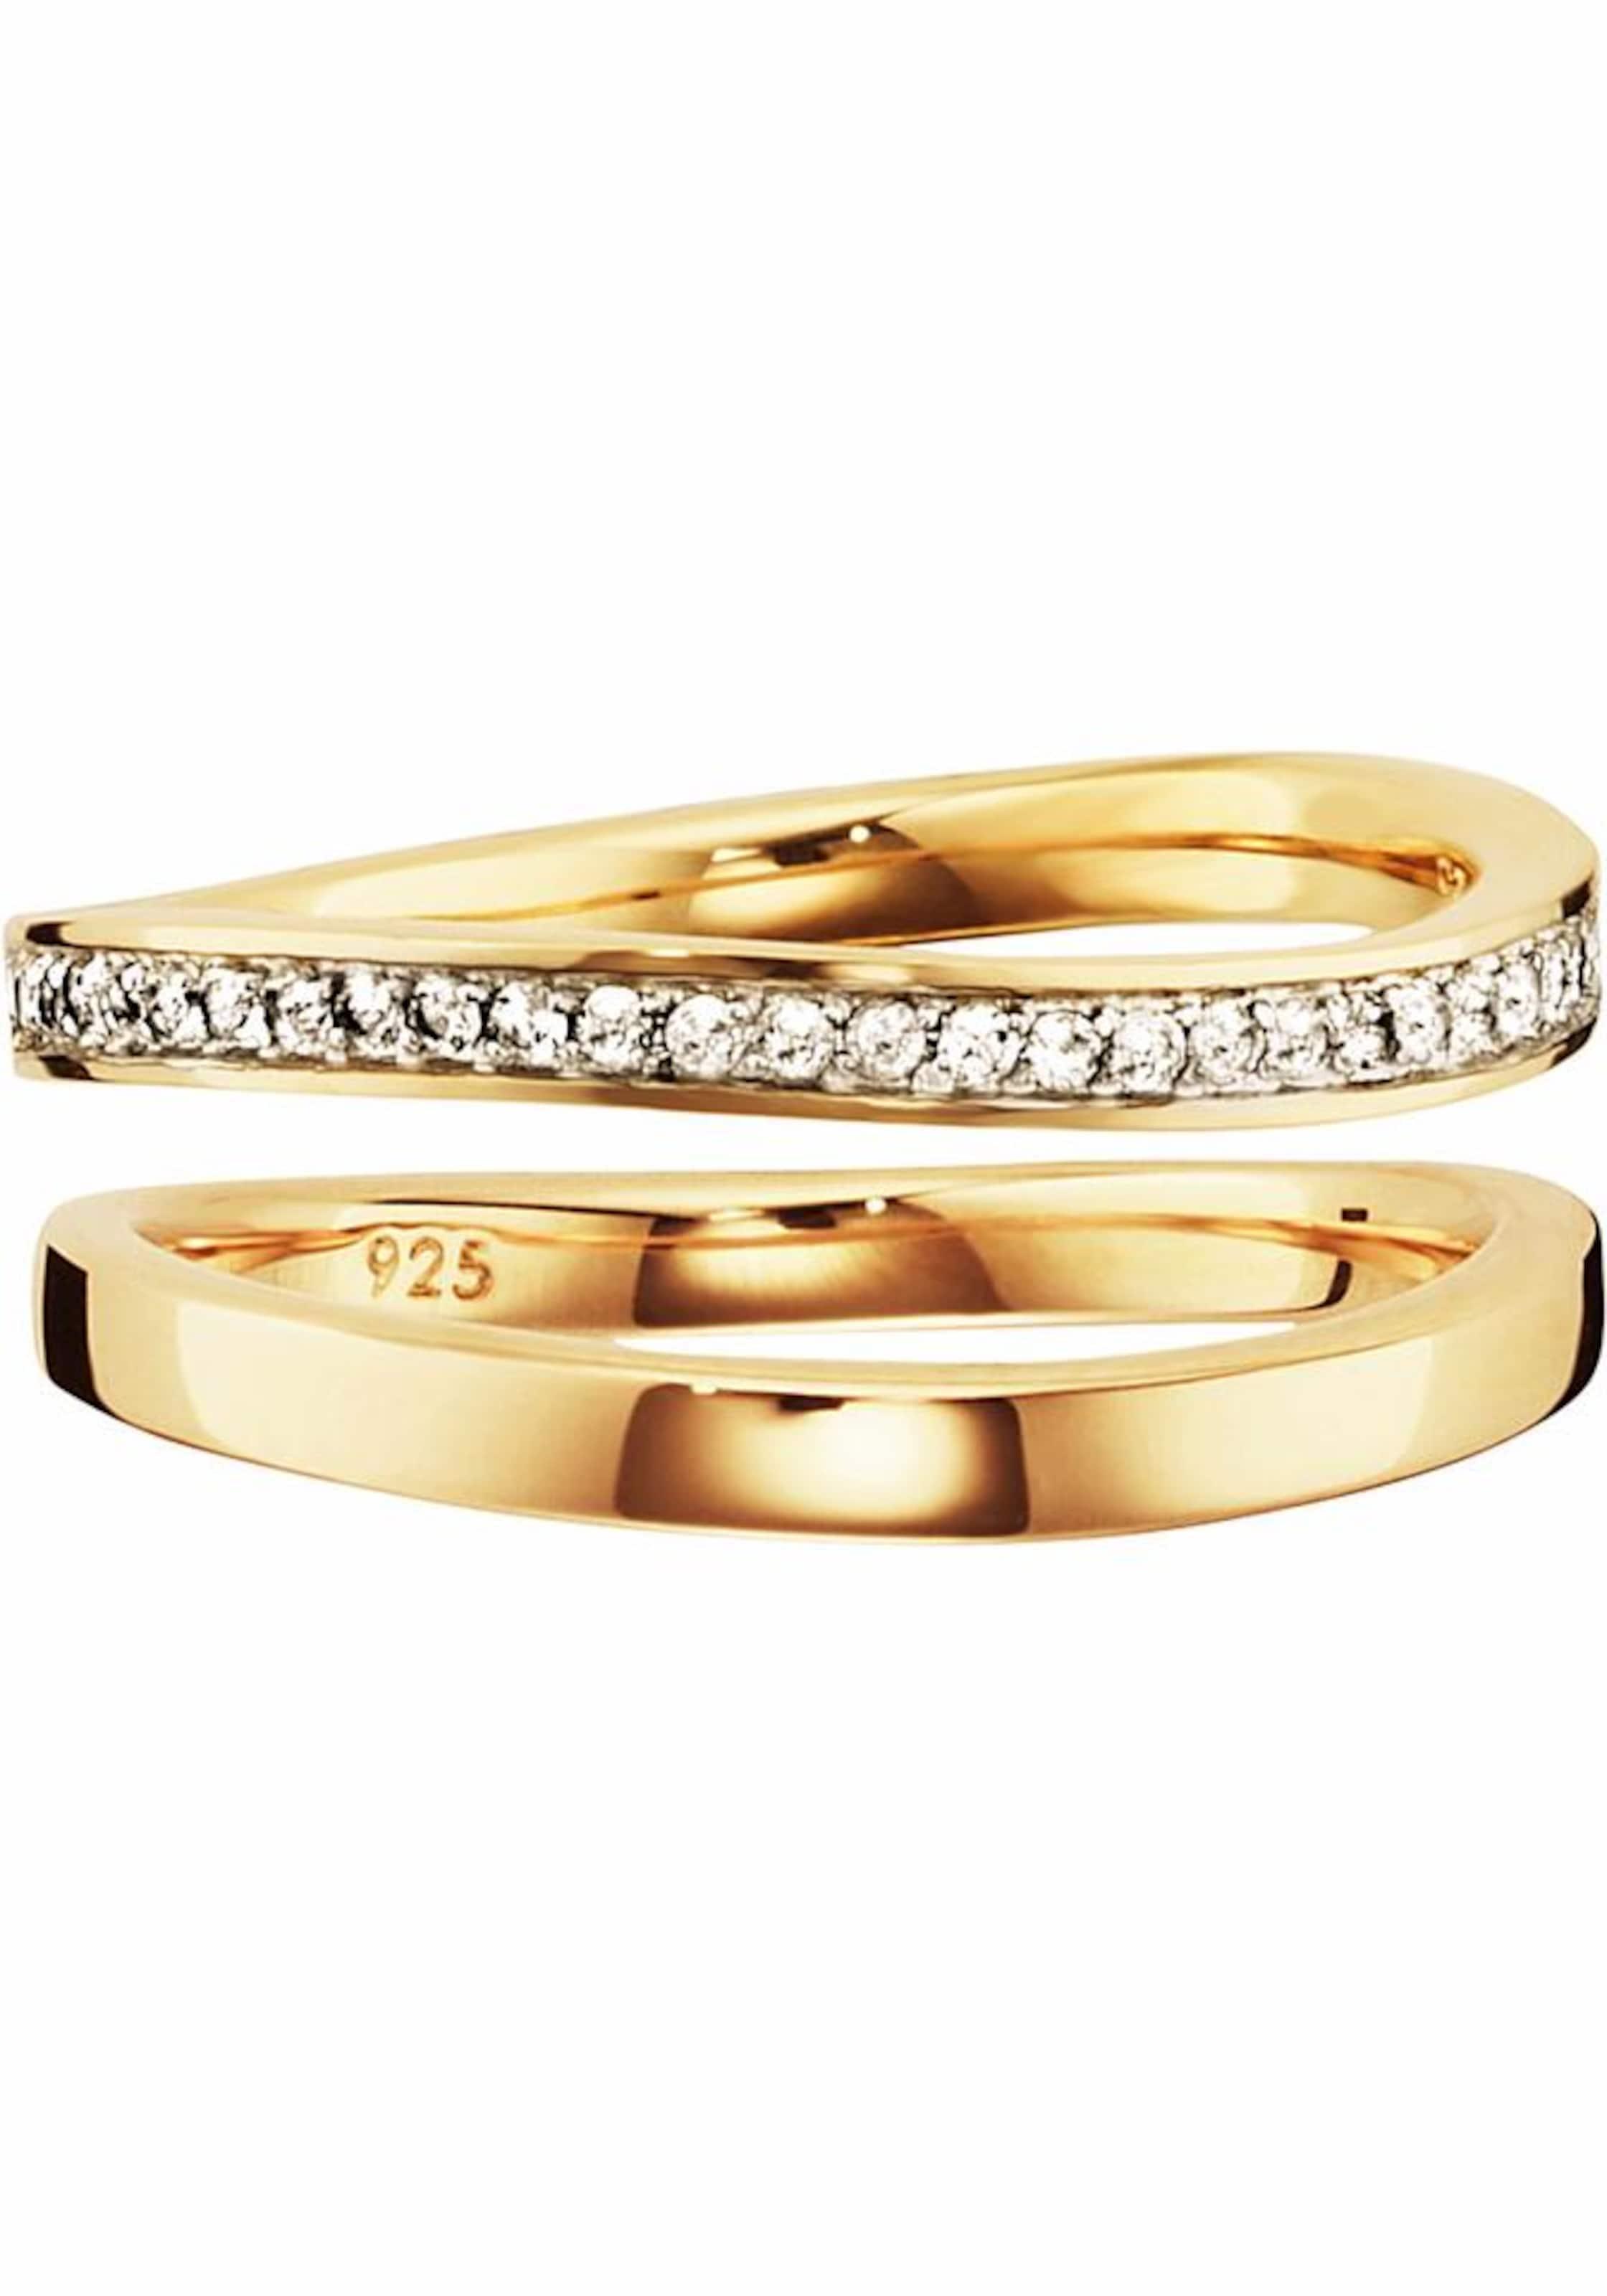 Gold Ring 'sensitive set Caï Dancer'set2 TlgIn xBrQoshdtC